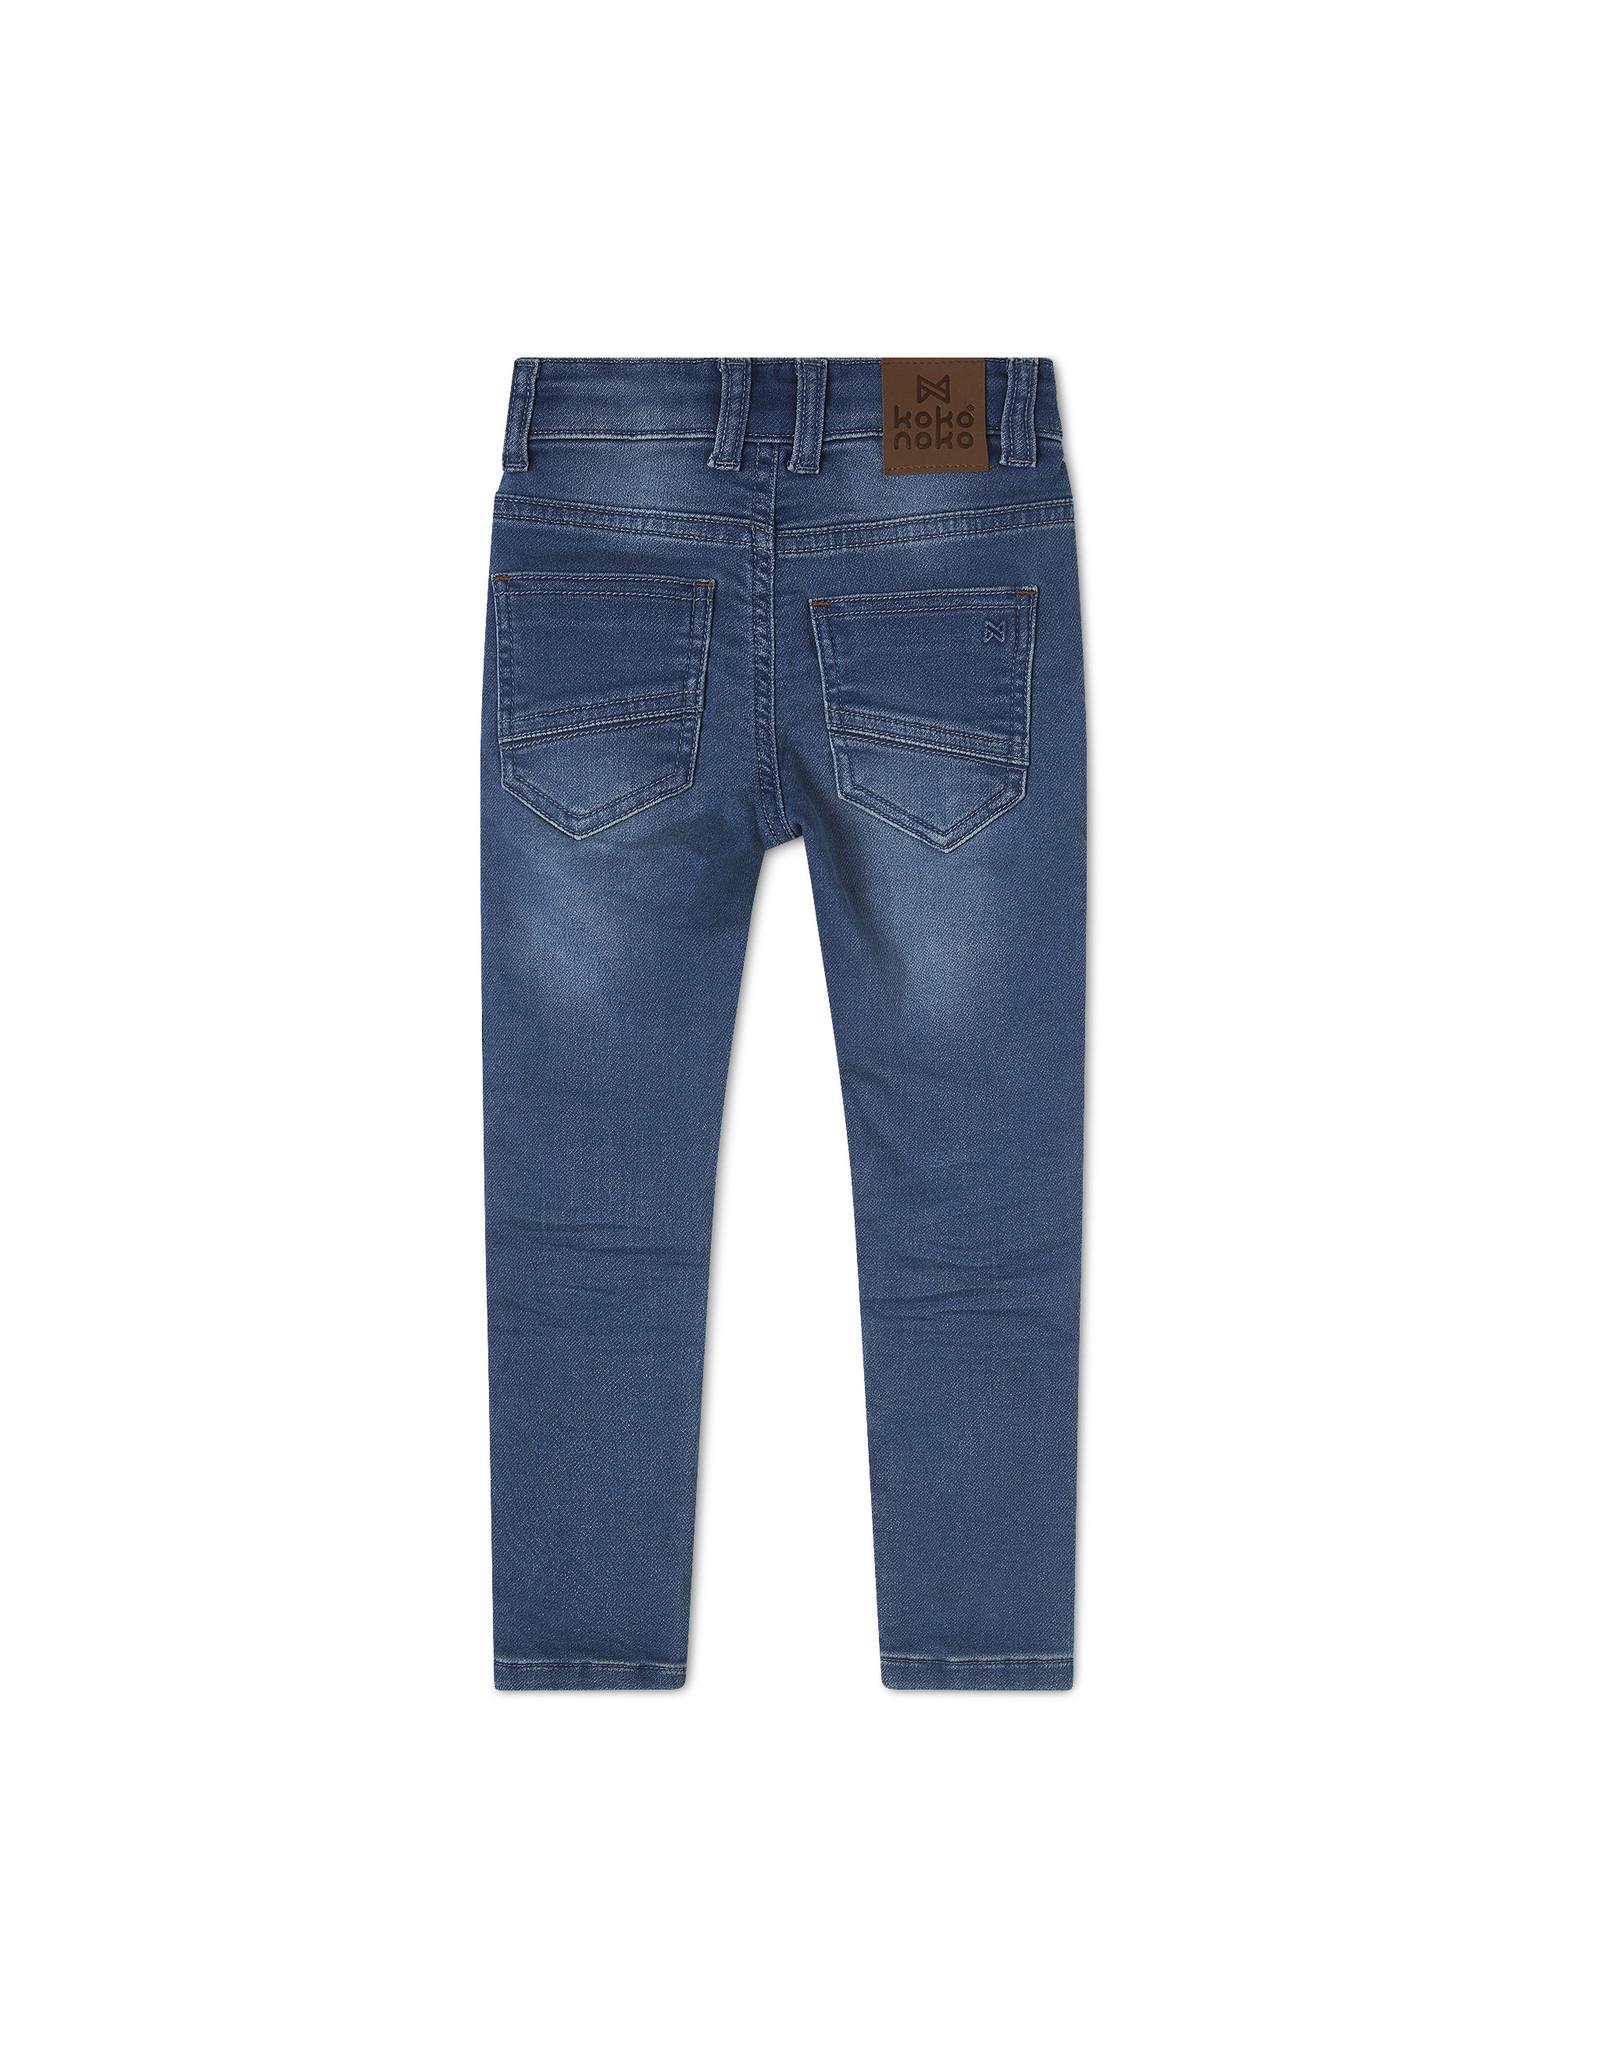 Koko Noko Koko Noko jongens Bio Cotton jeans Novan Blue